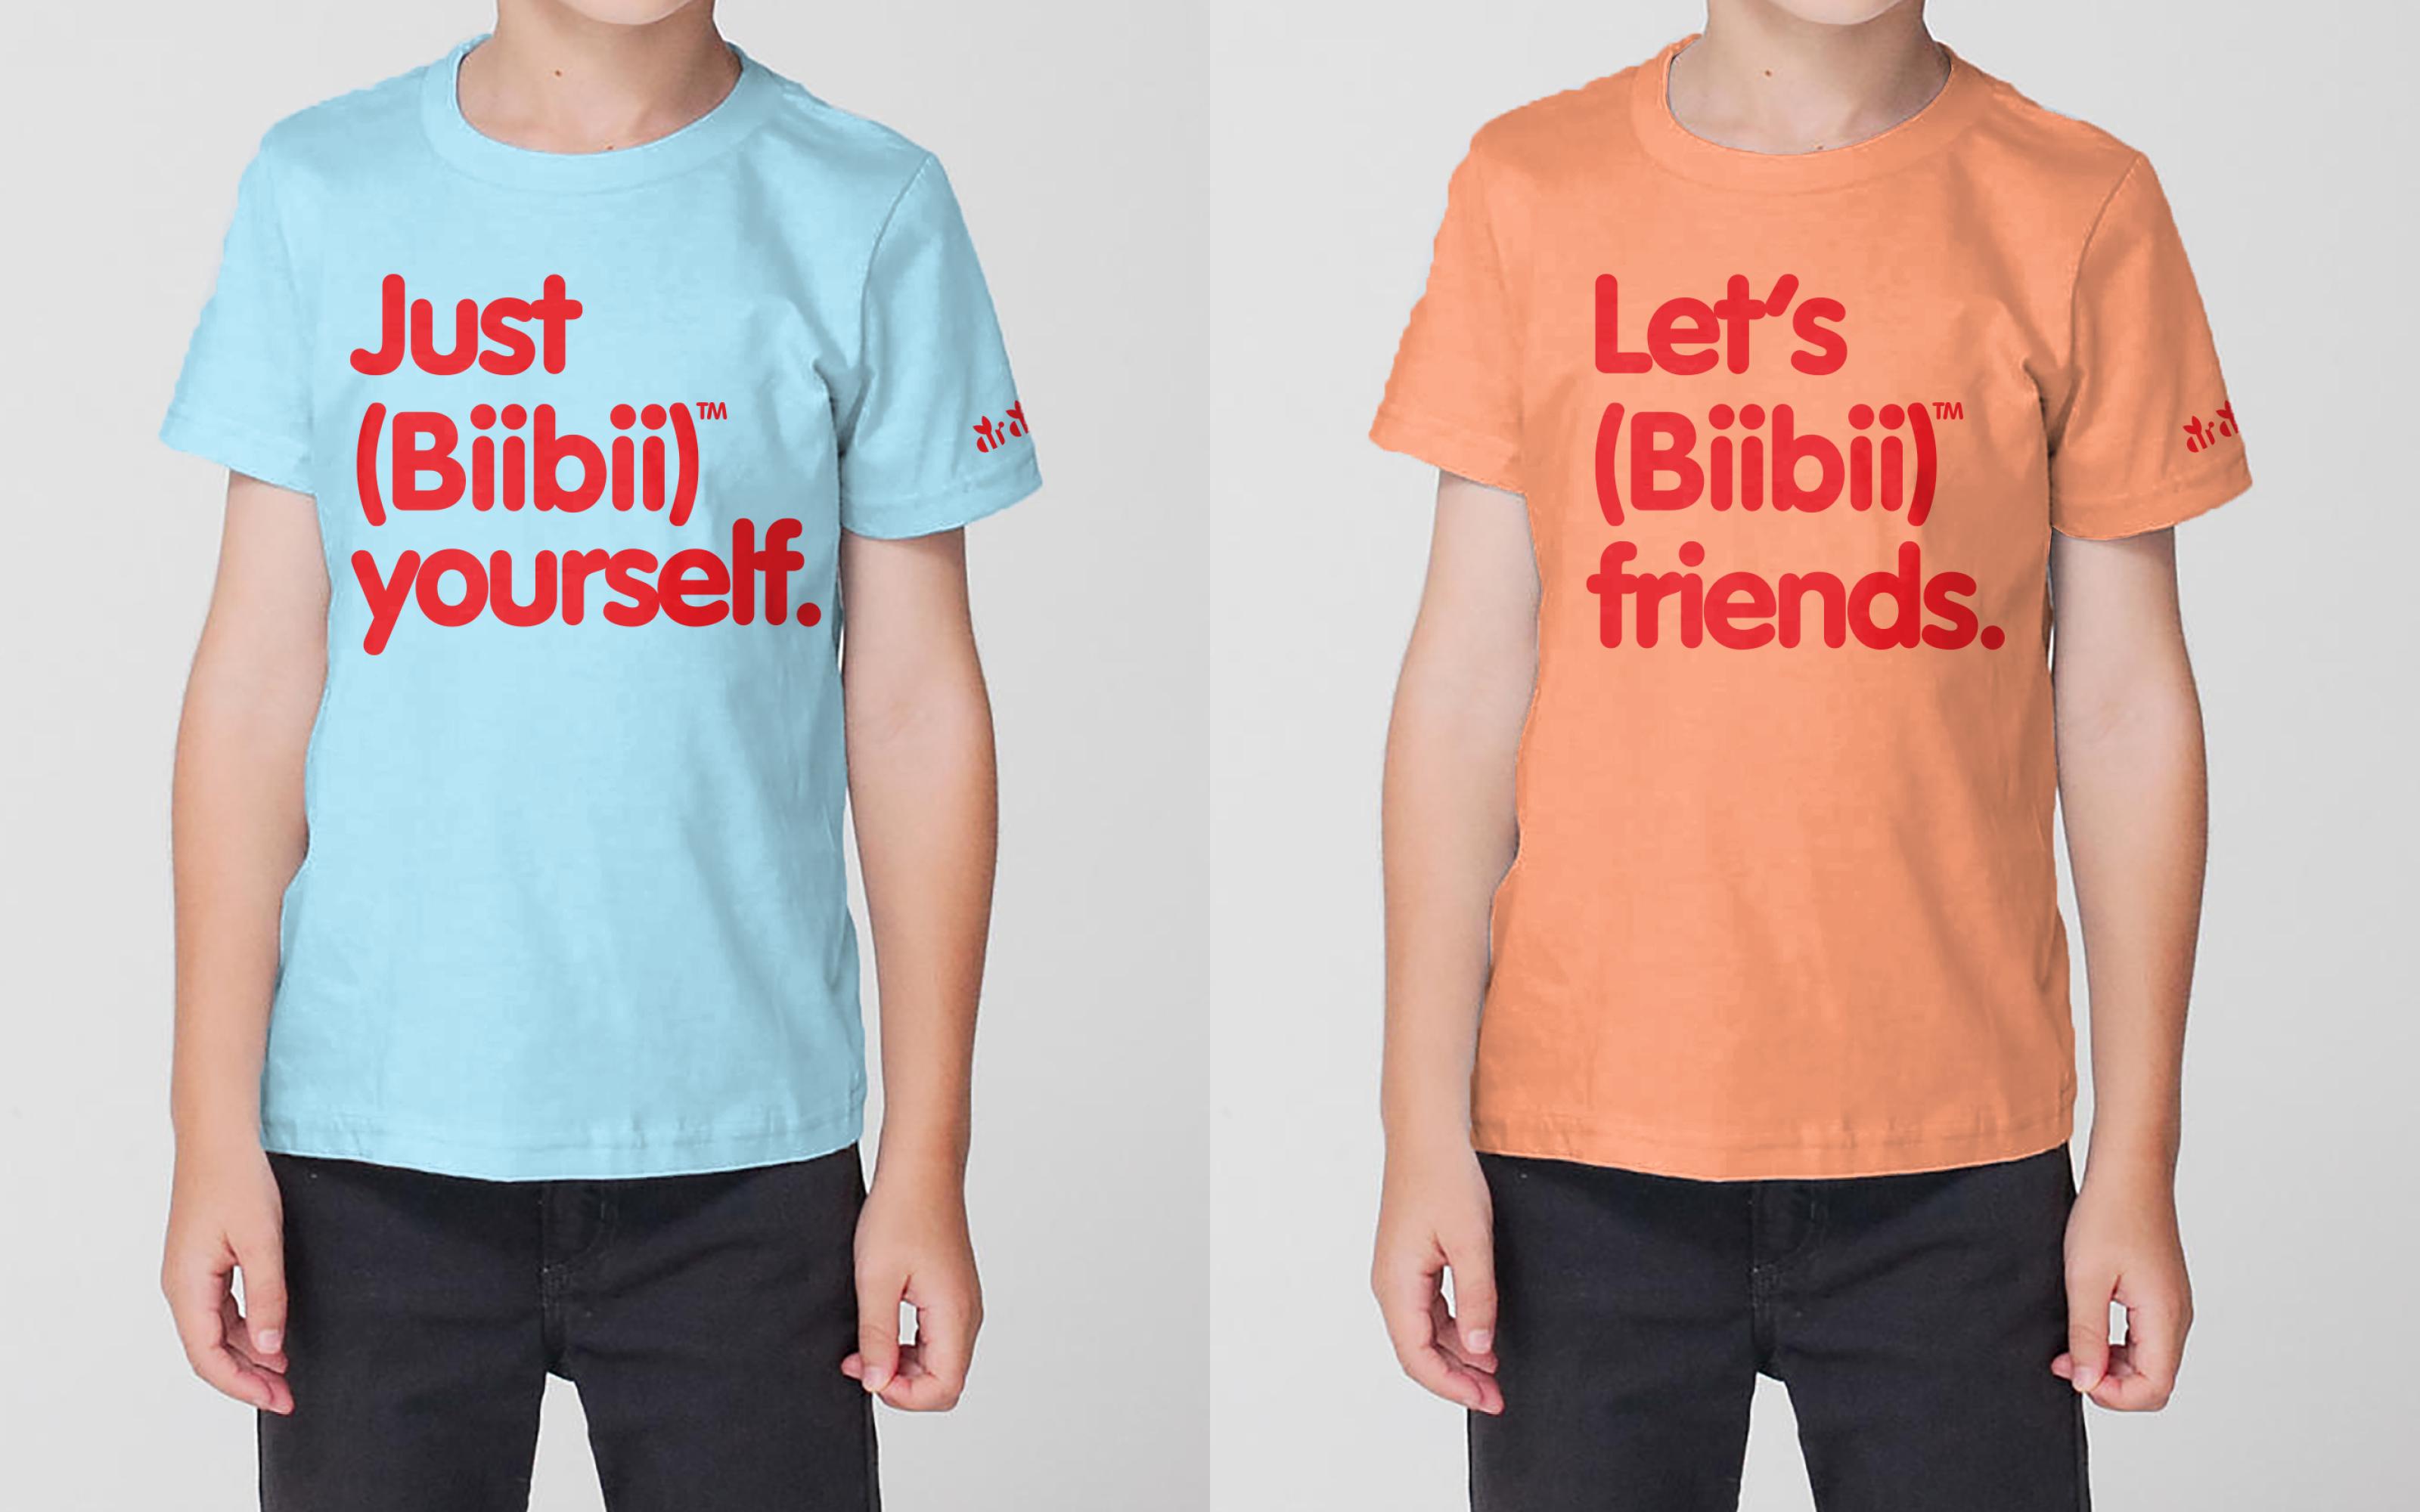 &then™ Biibii Tshirts